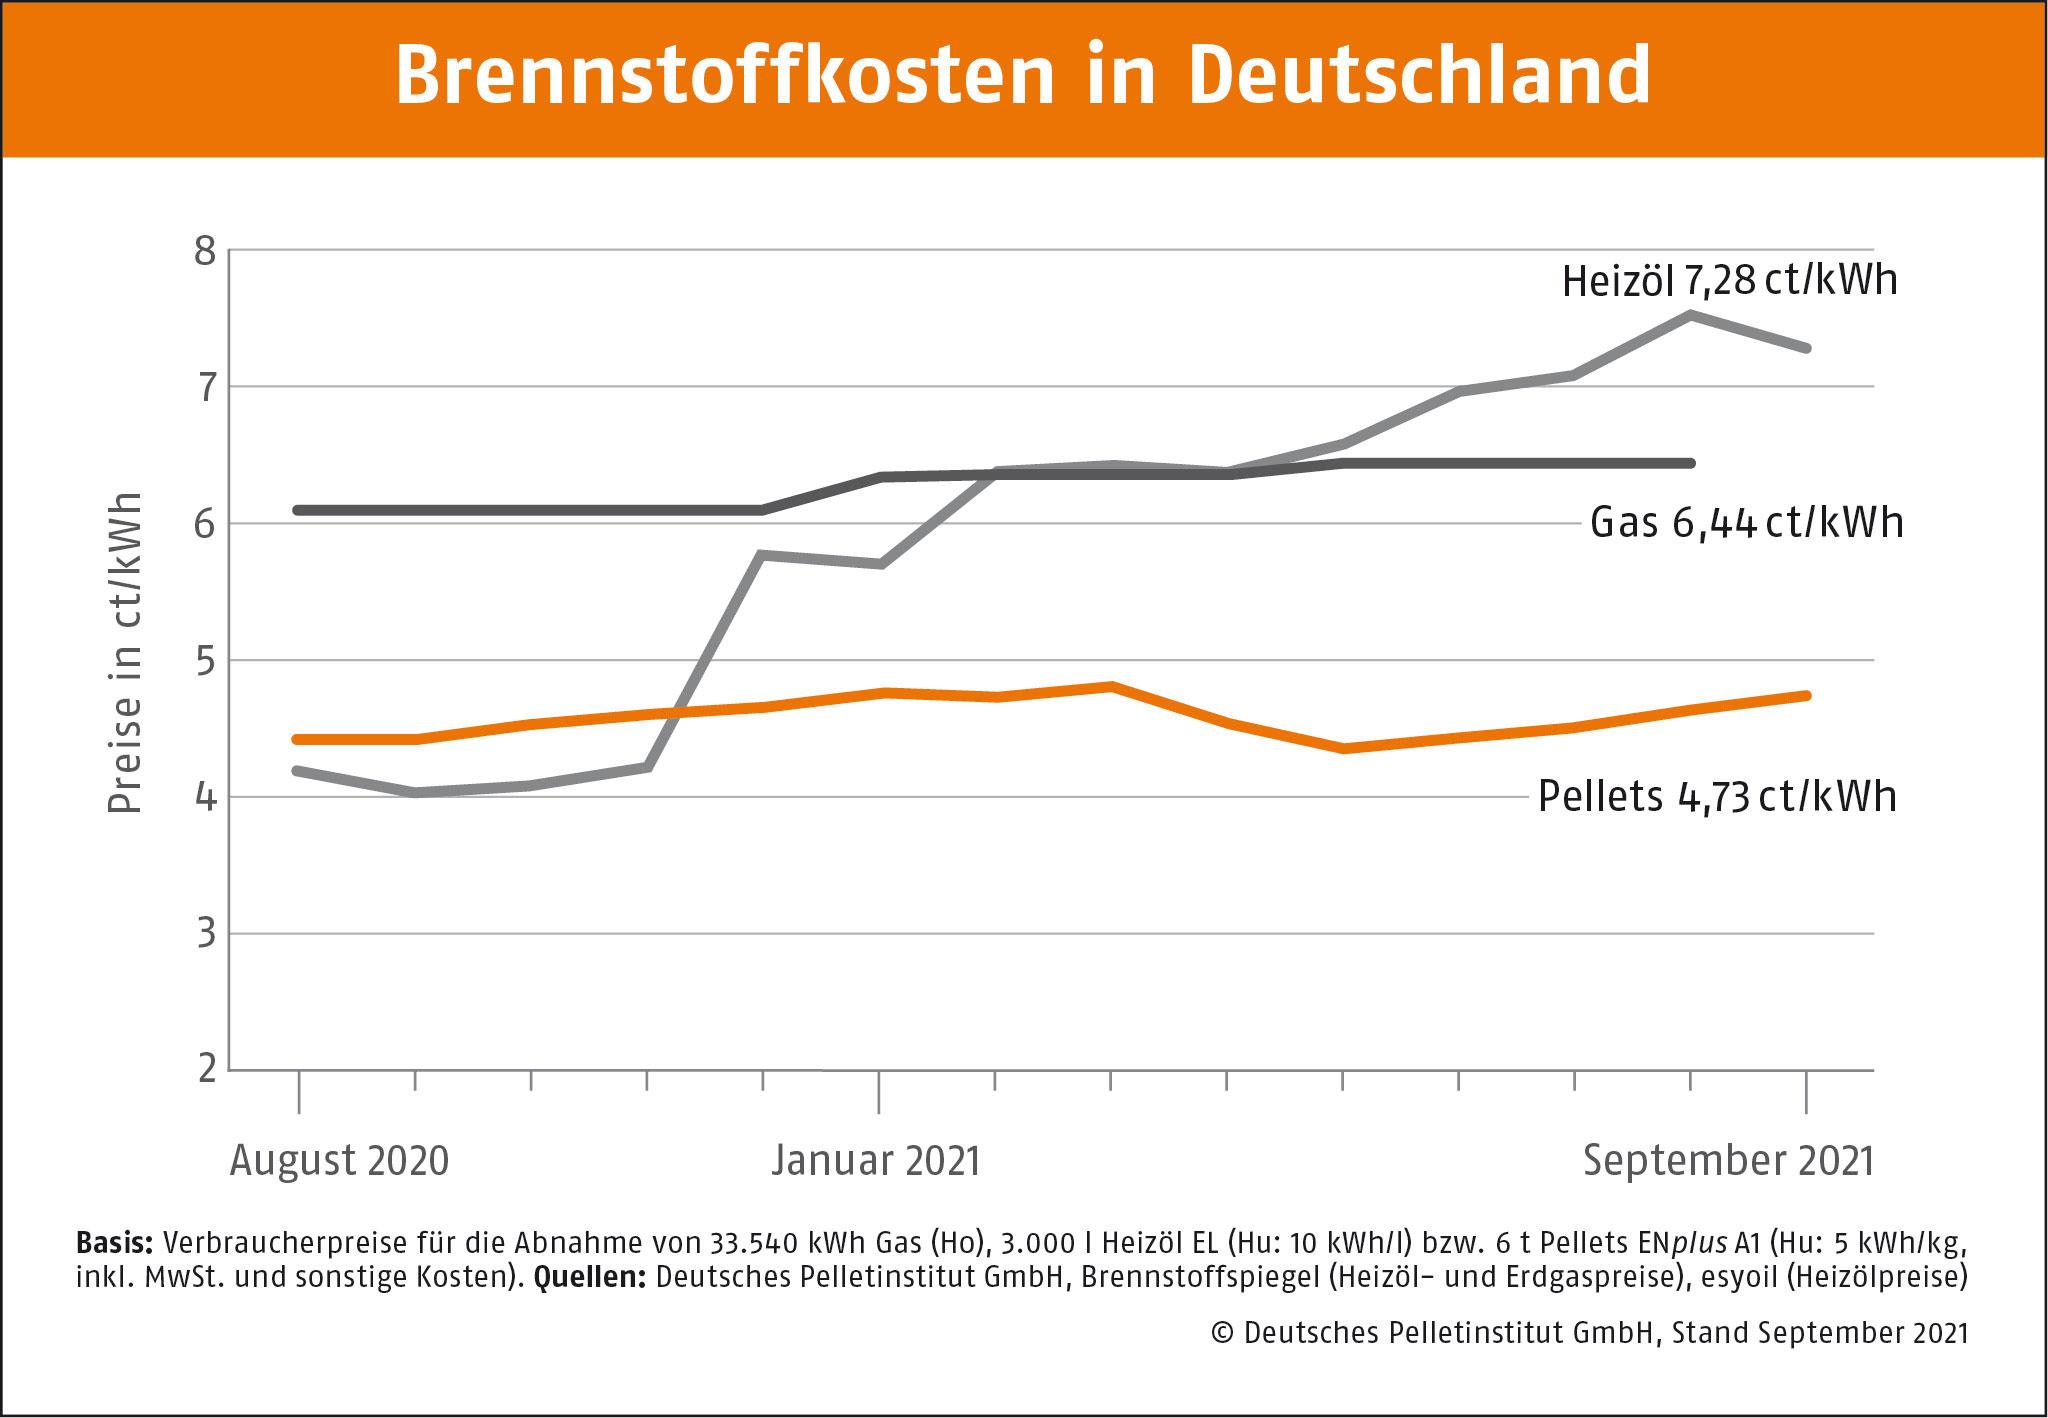 DEPI Brennstoffkosten in Deutschland DEPI Brennstoffkostgen September 2021